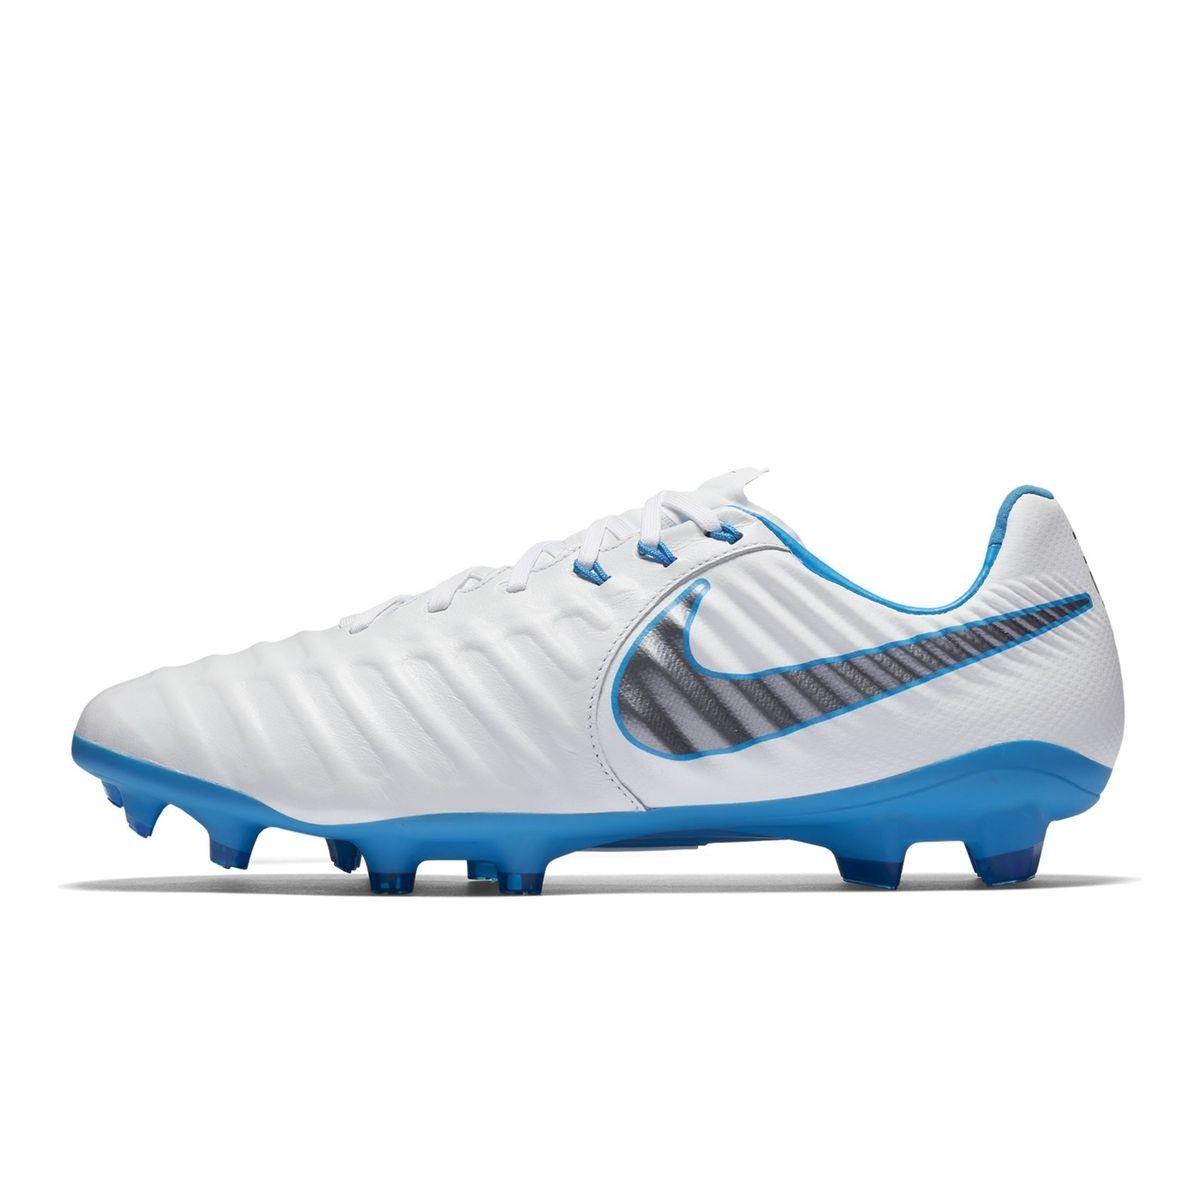 best service 2149c d8370 ... denmark chaussures football nike tiempo legend vii pro fg blanc taille  4041 fb7e0 63df0